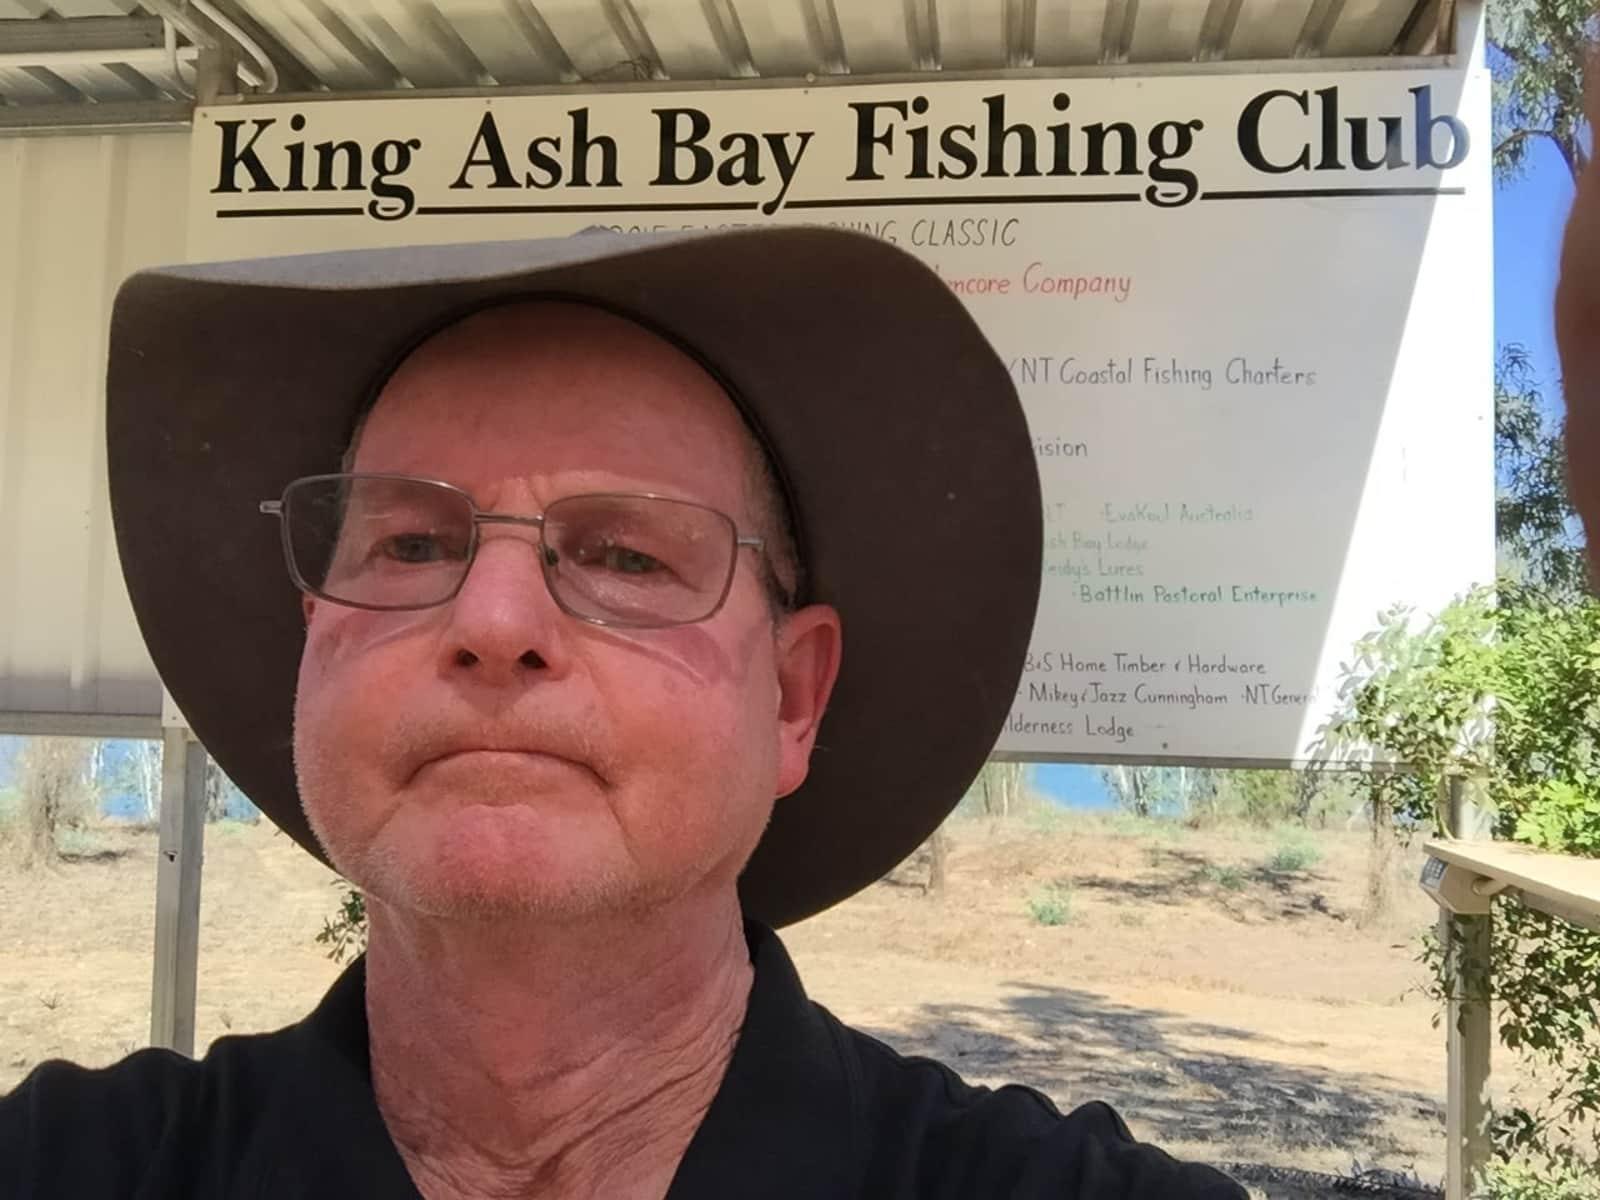 John from Geelong, Victoria, Australia